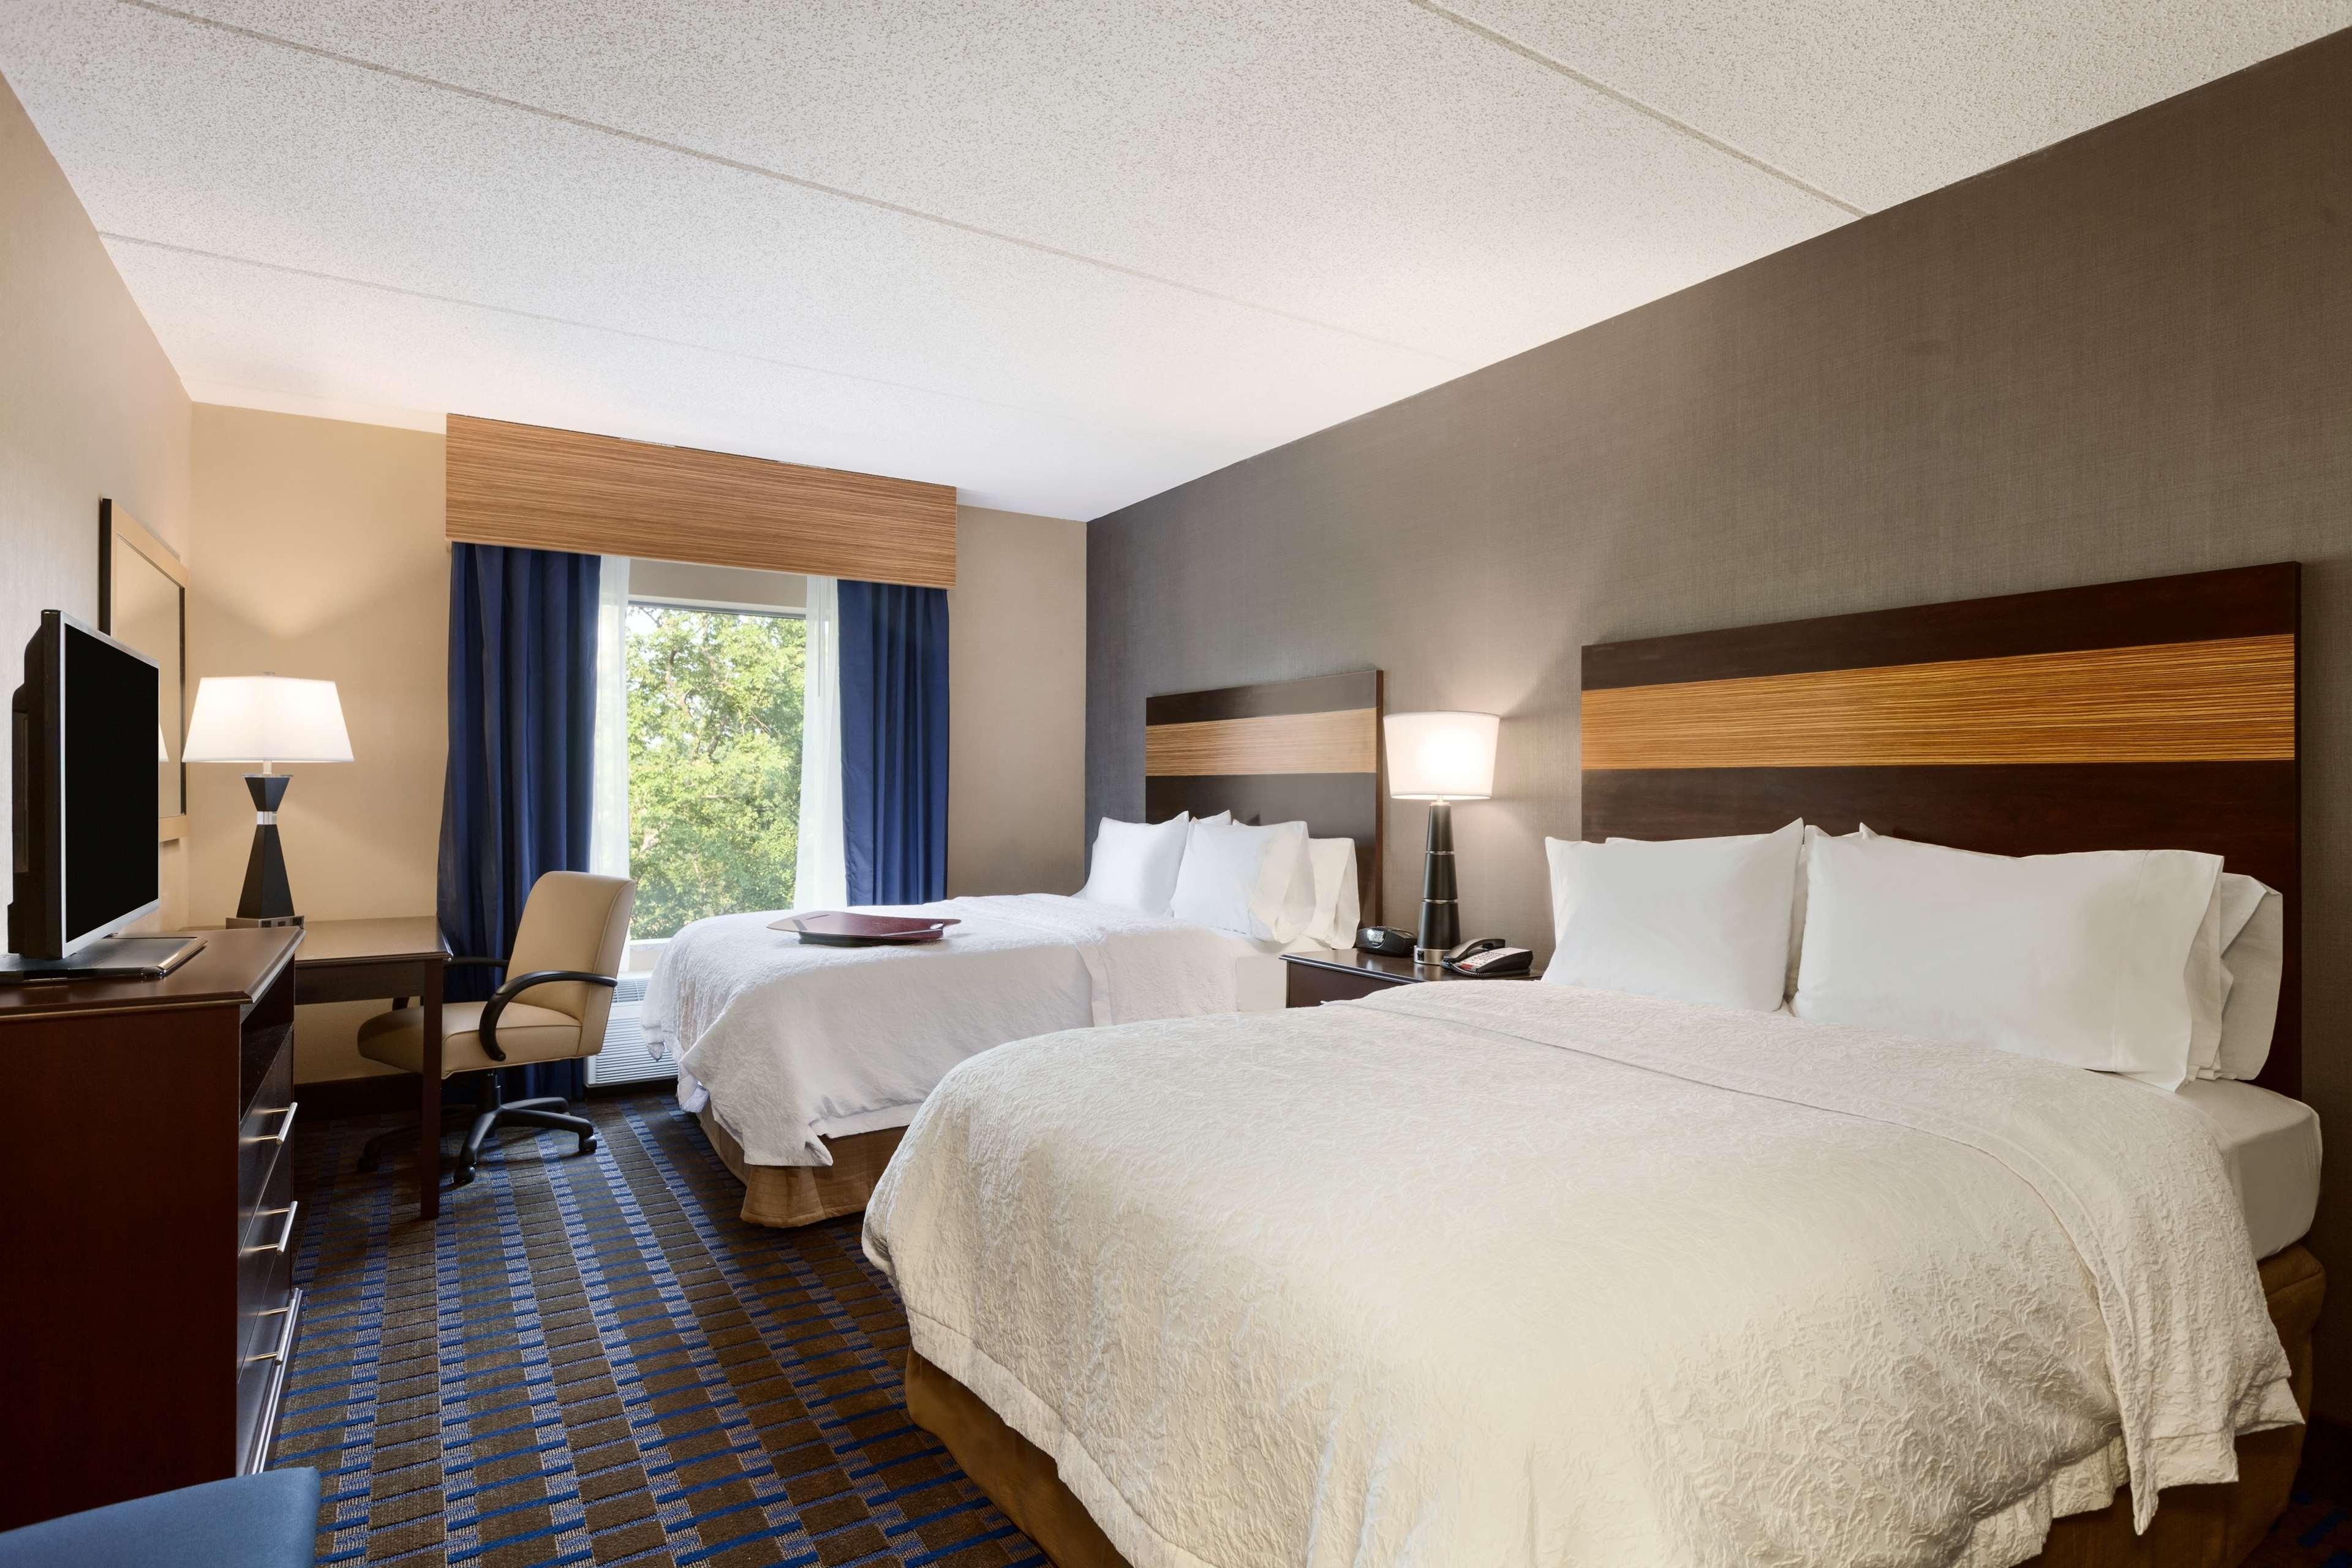 Hampton Inn & Suites Camp Springs/Andrews AFB image 7